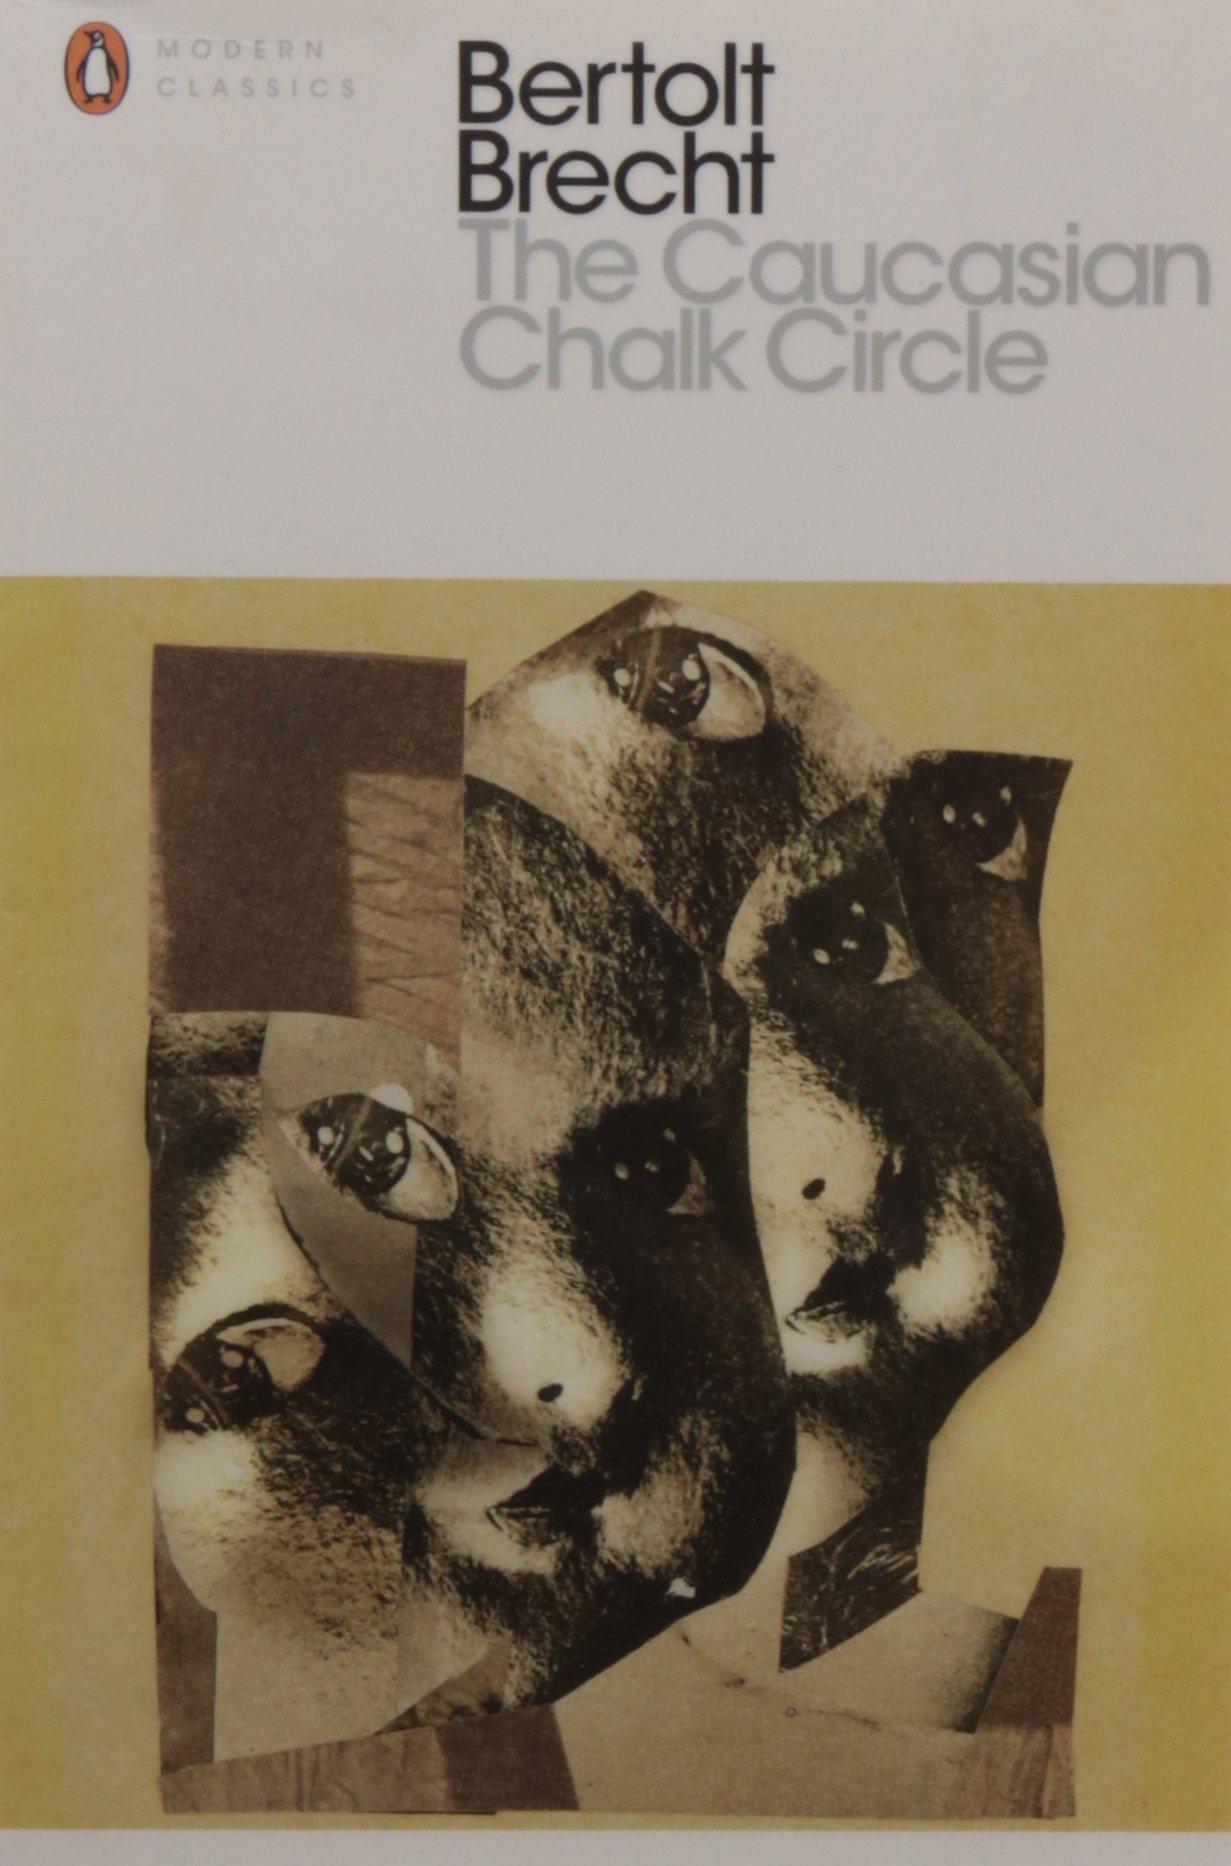 The Caucasian Chalk Circle (Penguin Modern Classics): Amazon.co.uk: Bertolt  Brecht, Eric Bentley: 9780141189161: Books